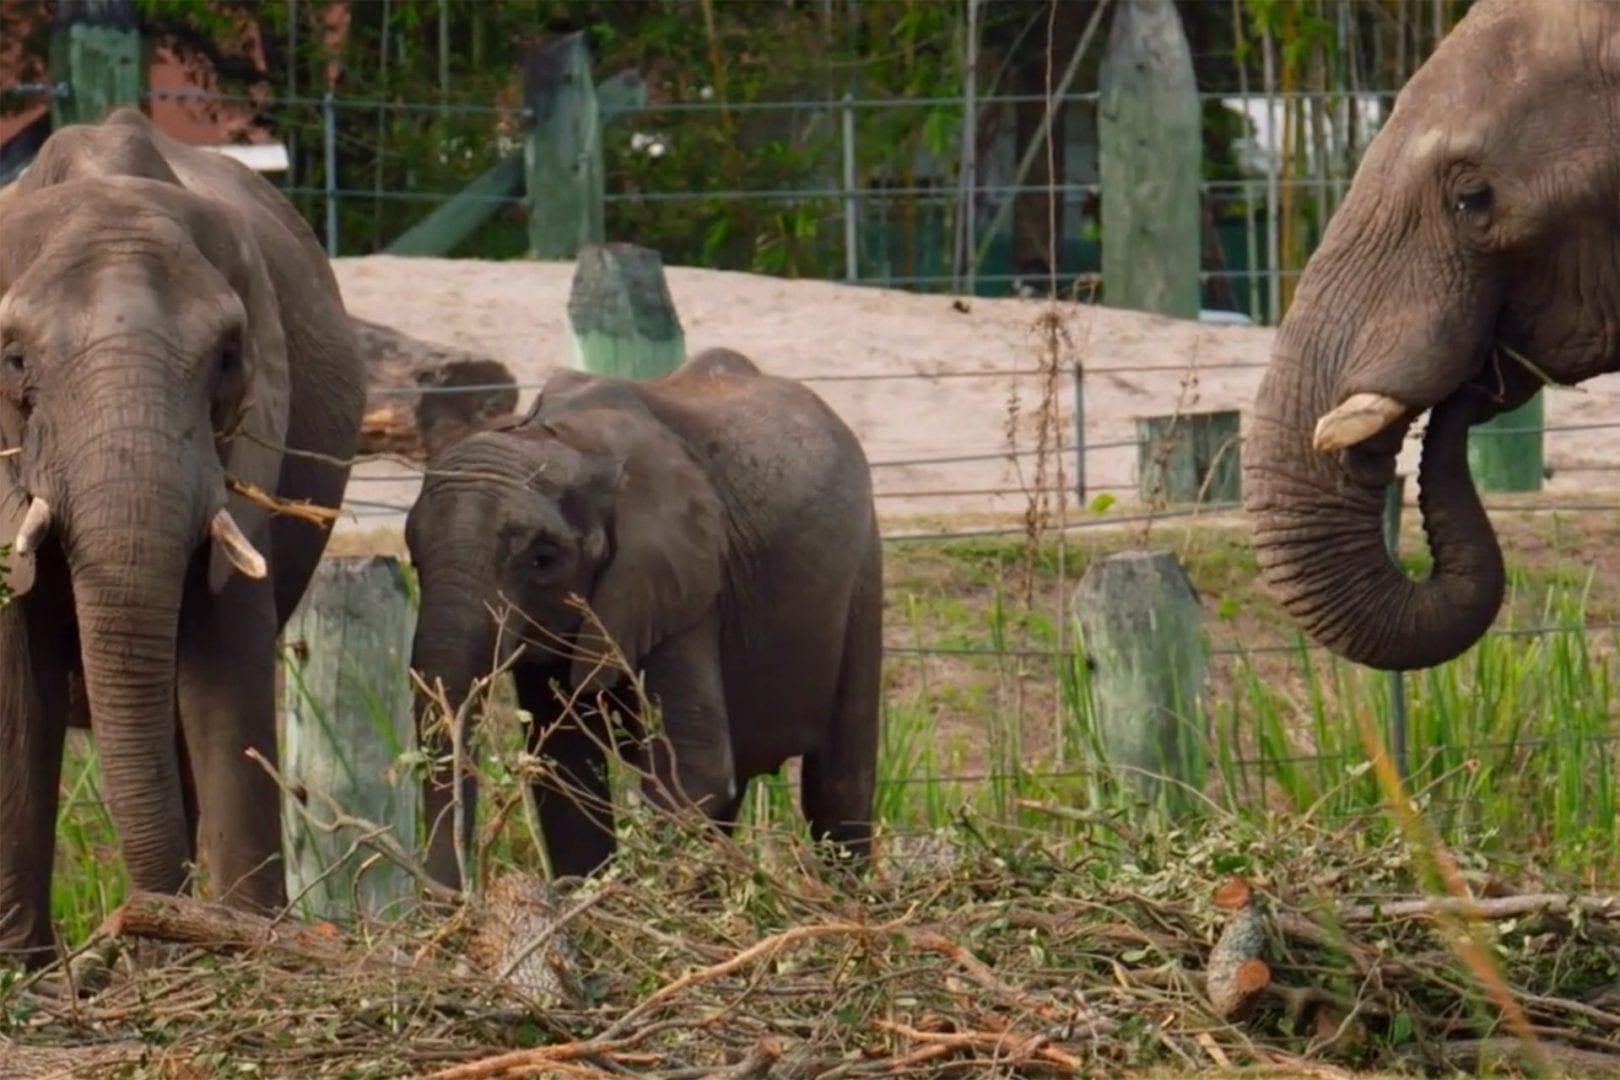 Elephants at a zoo eating